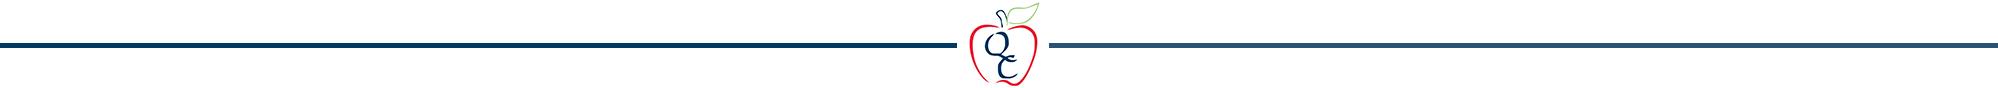 decorative queen creek logo